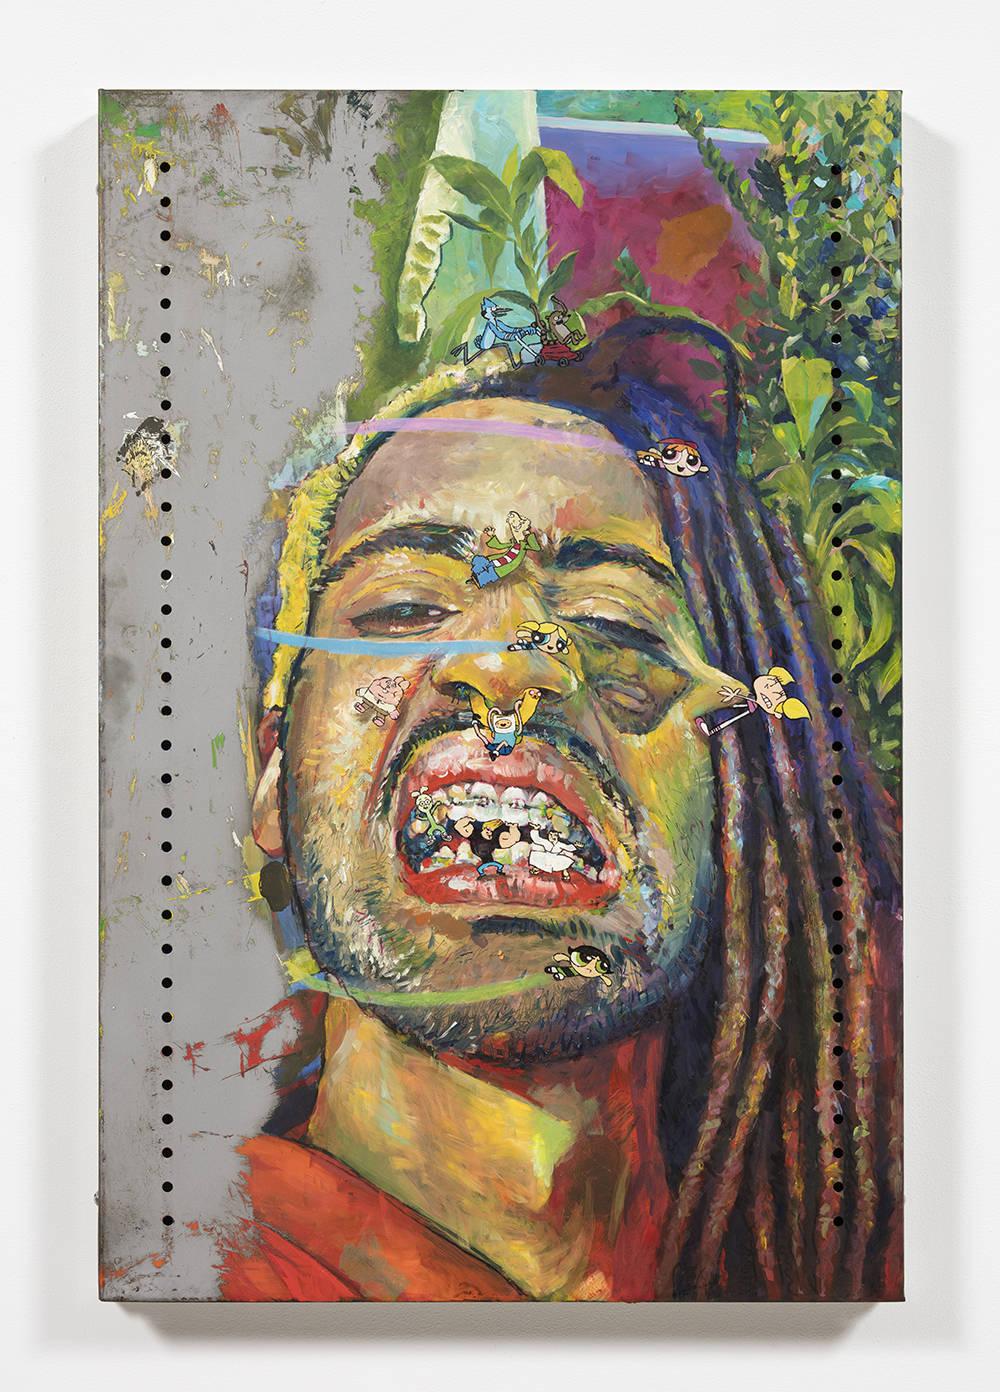 Untitled Self-Portrait 3 (blossom, ed, bubbles, dee dee, richard watterson, jake, finn, onion, johnny bravo, jack and buttercup)